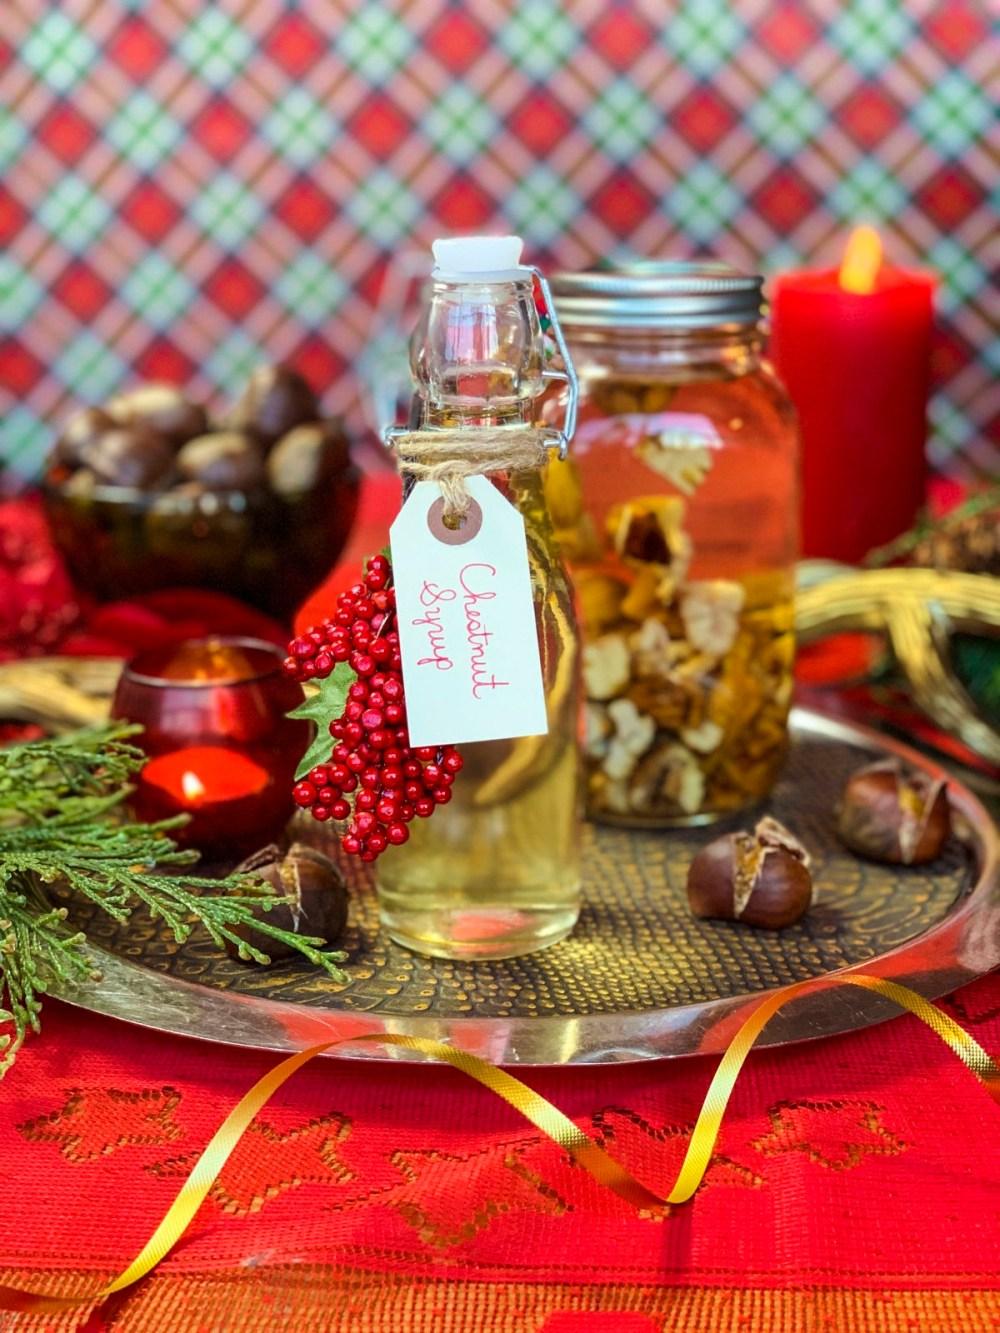 Make Chocolate Bark Themed to Classic Christmas Movies